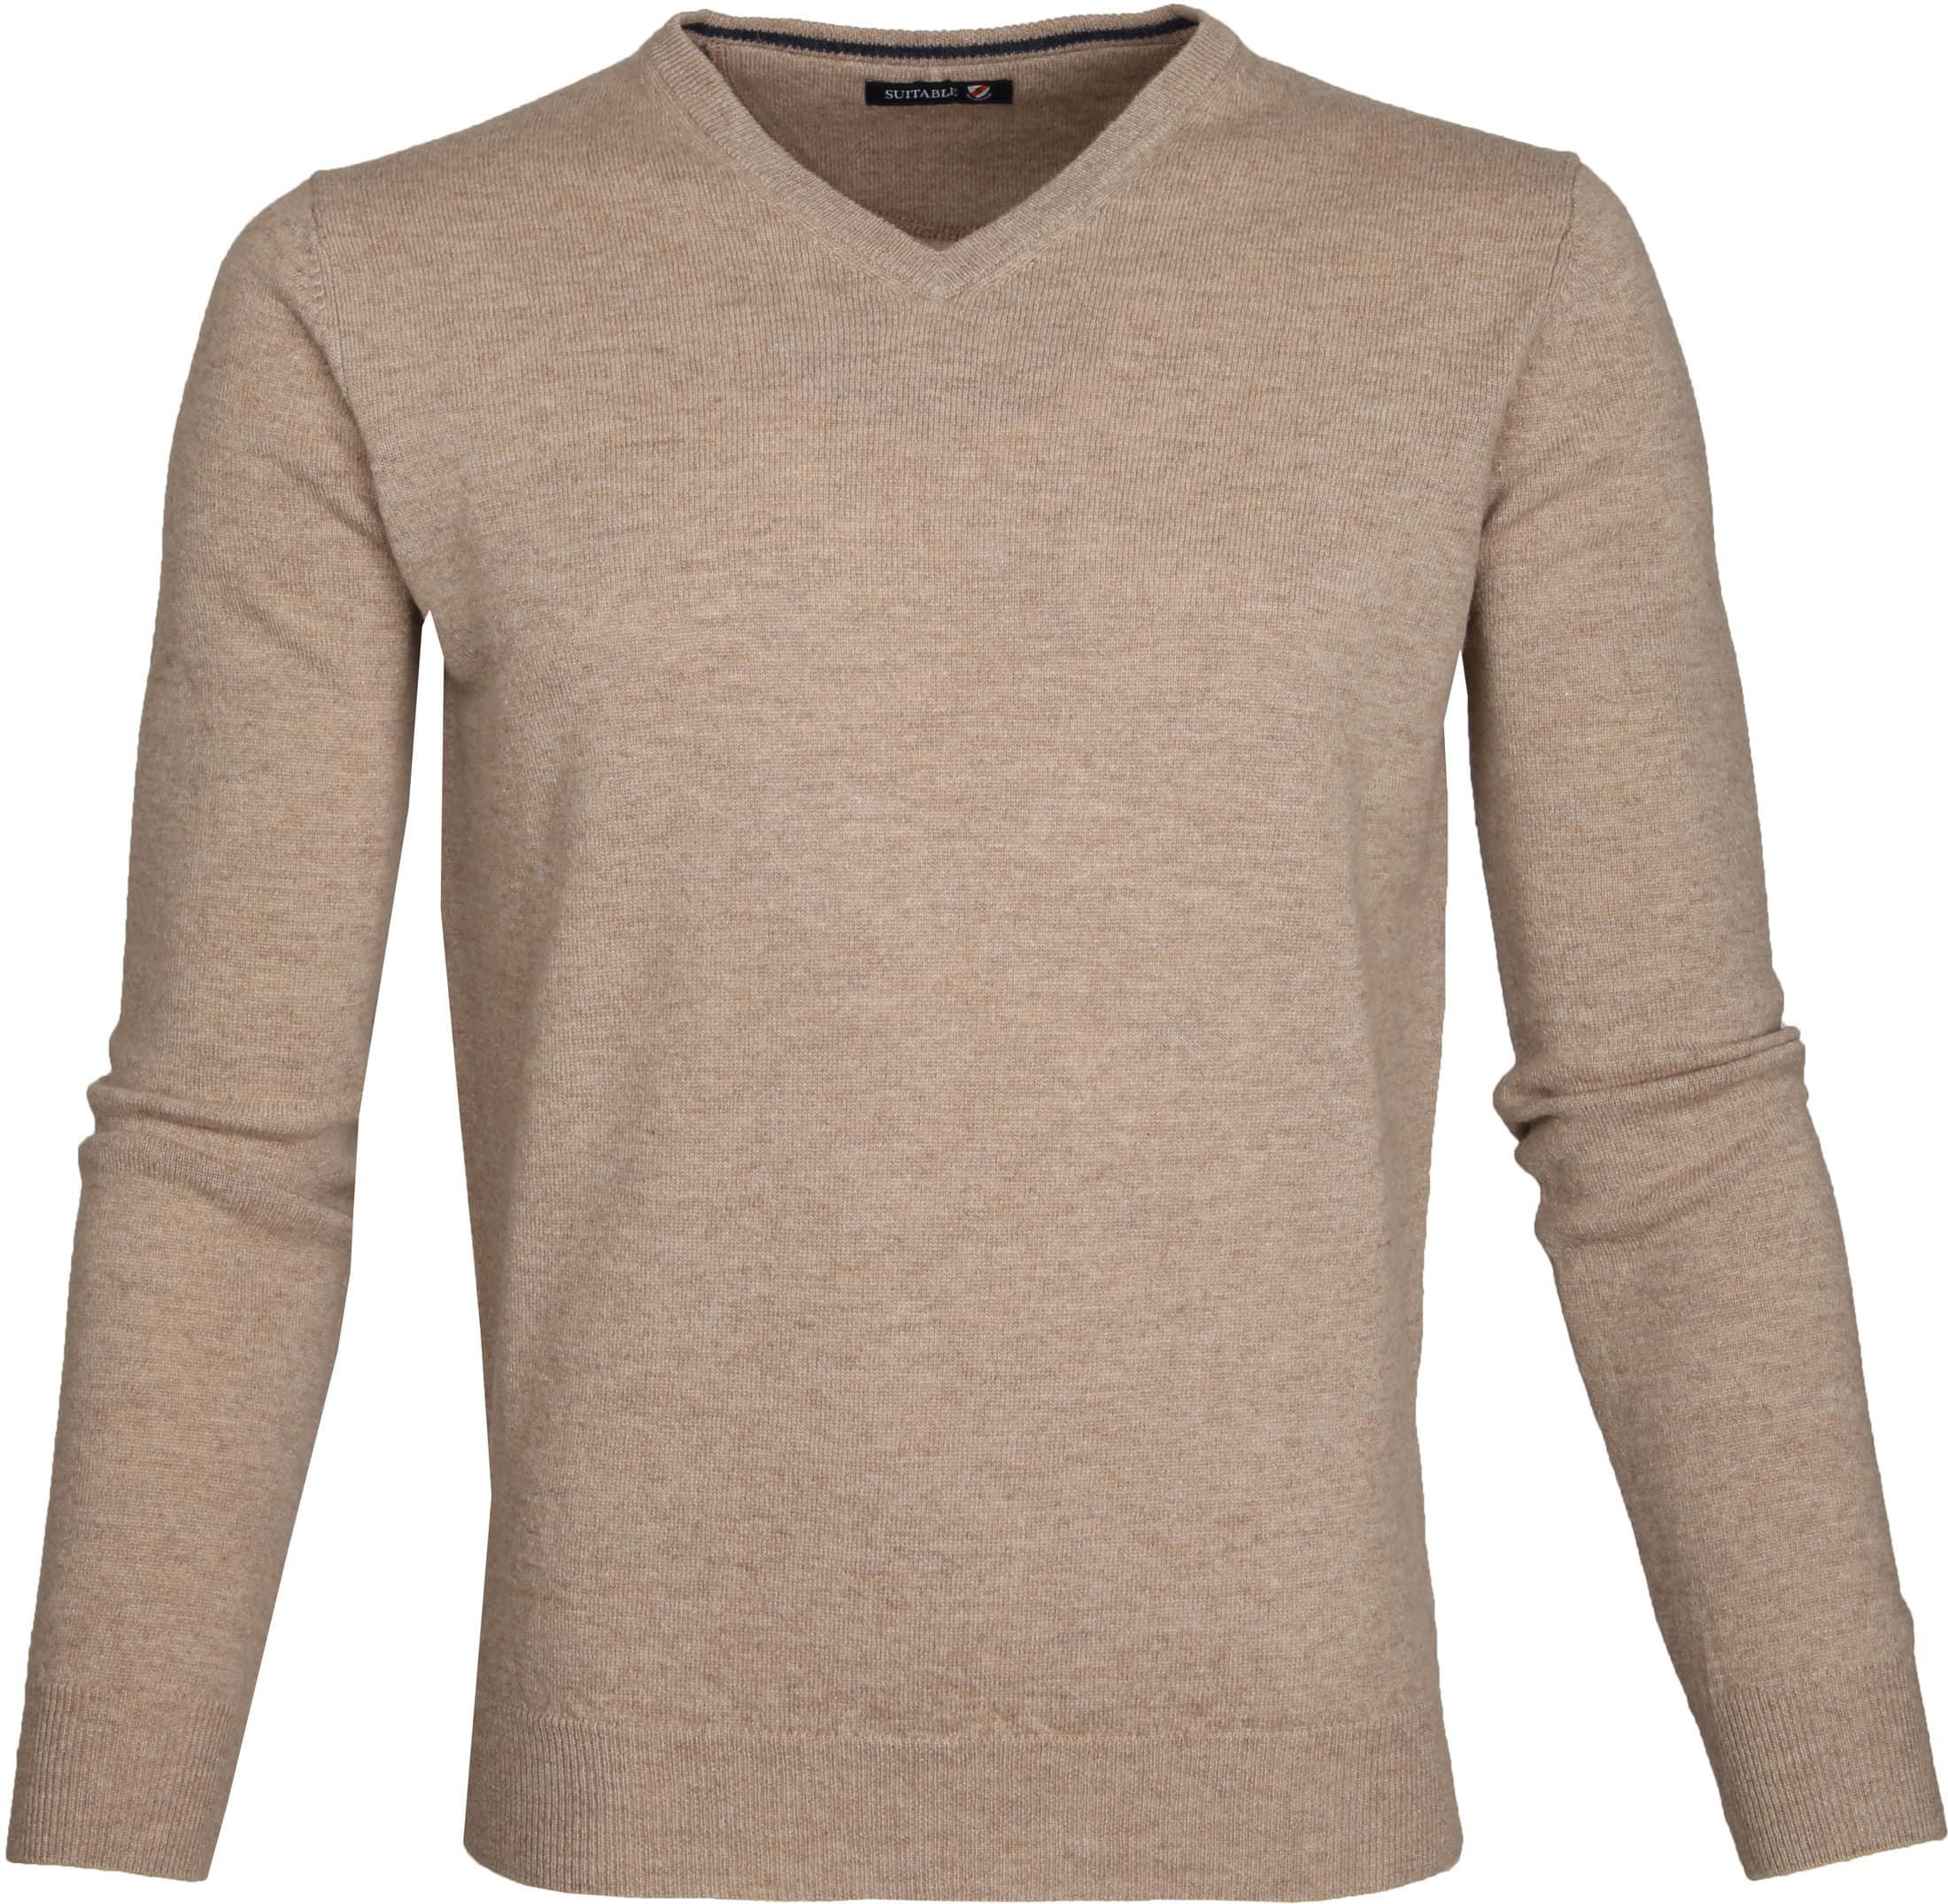 Suitable Pullover Lammwolle V-Ausschnitt Beige foto 0